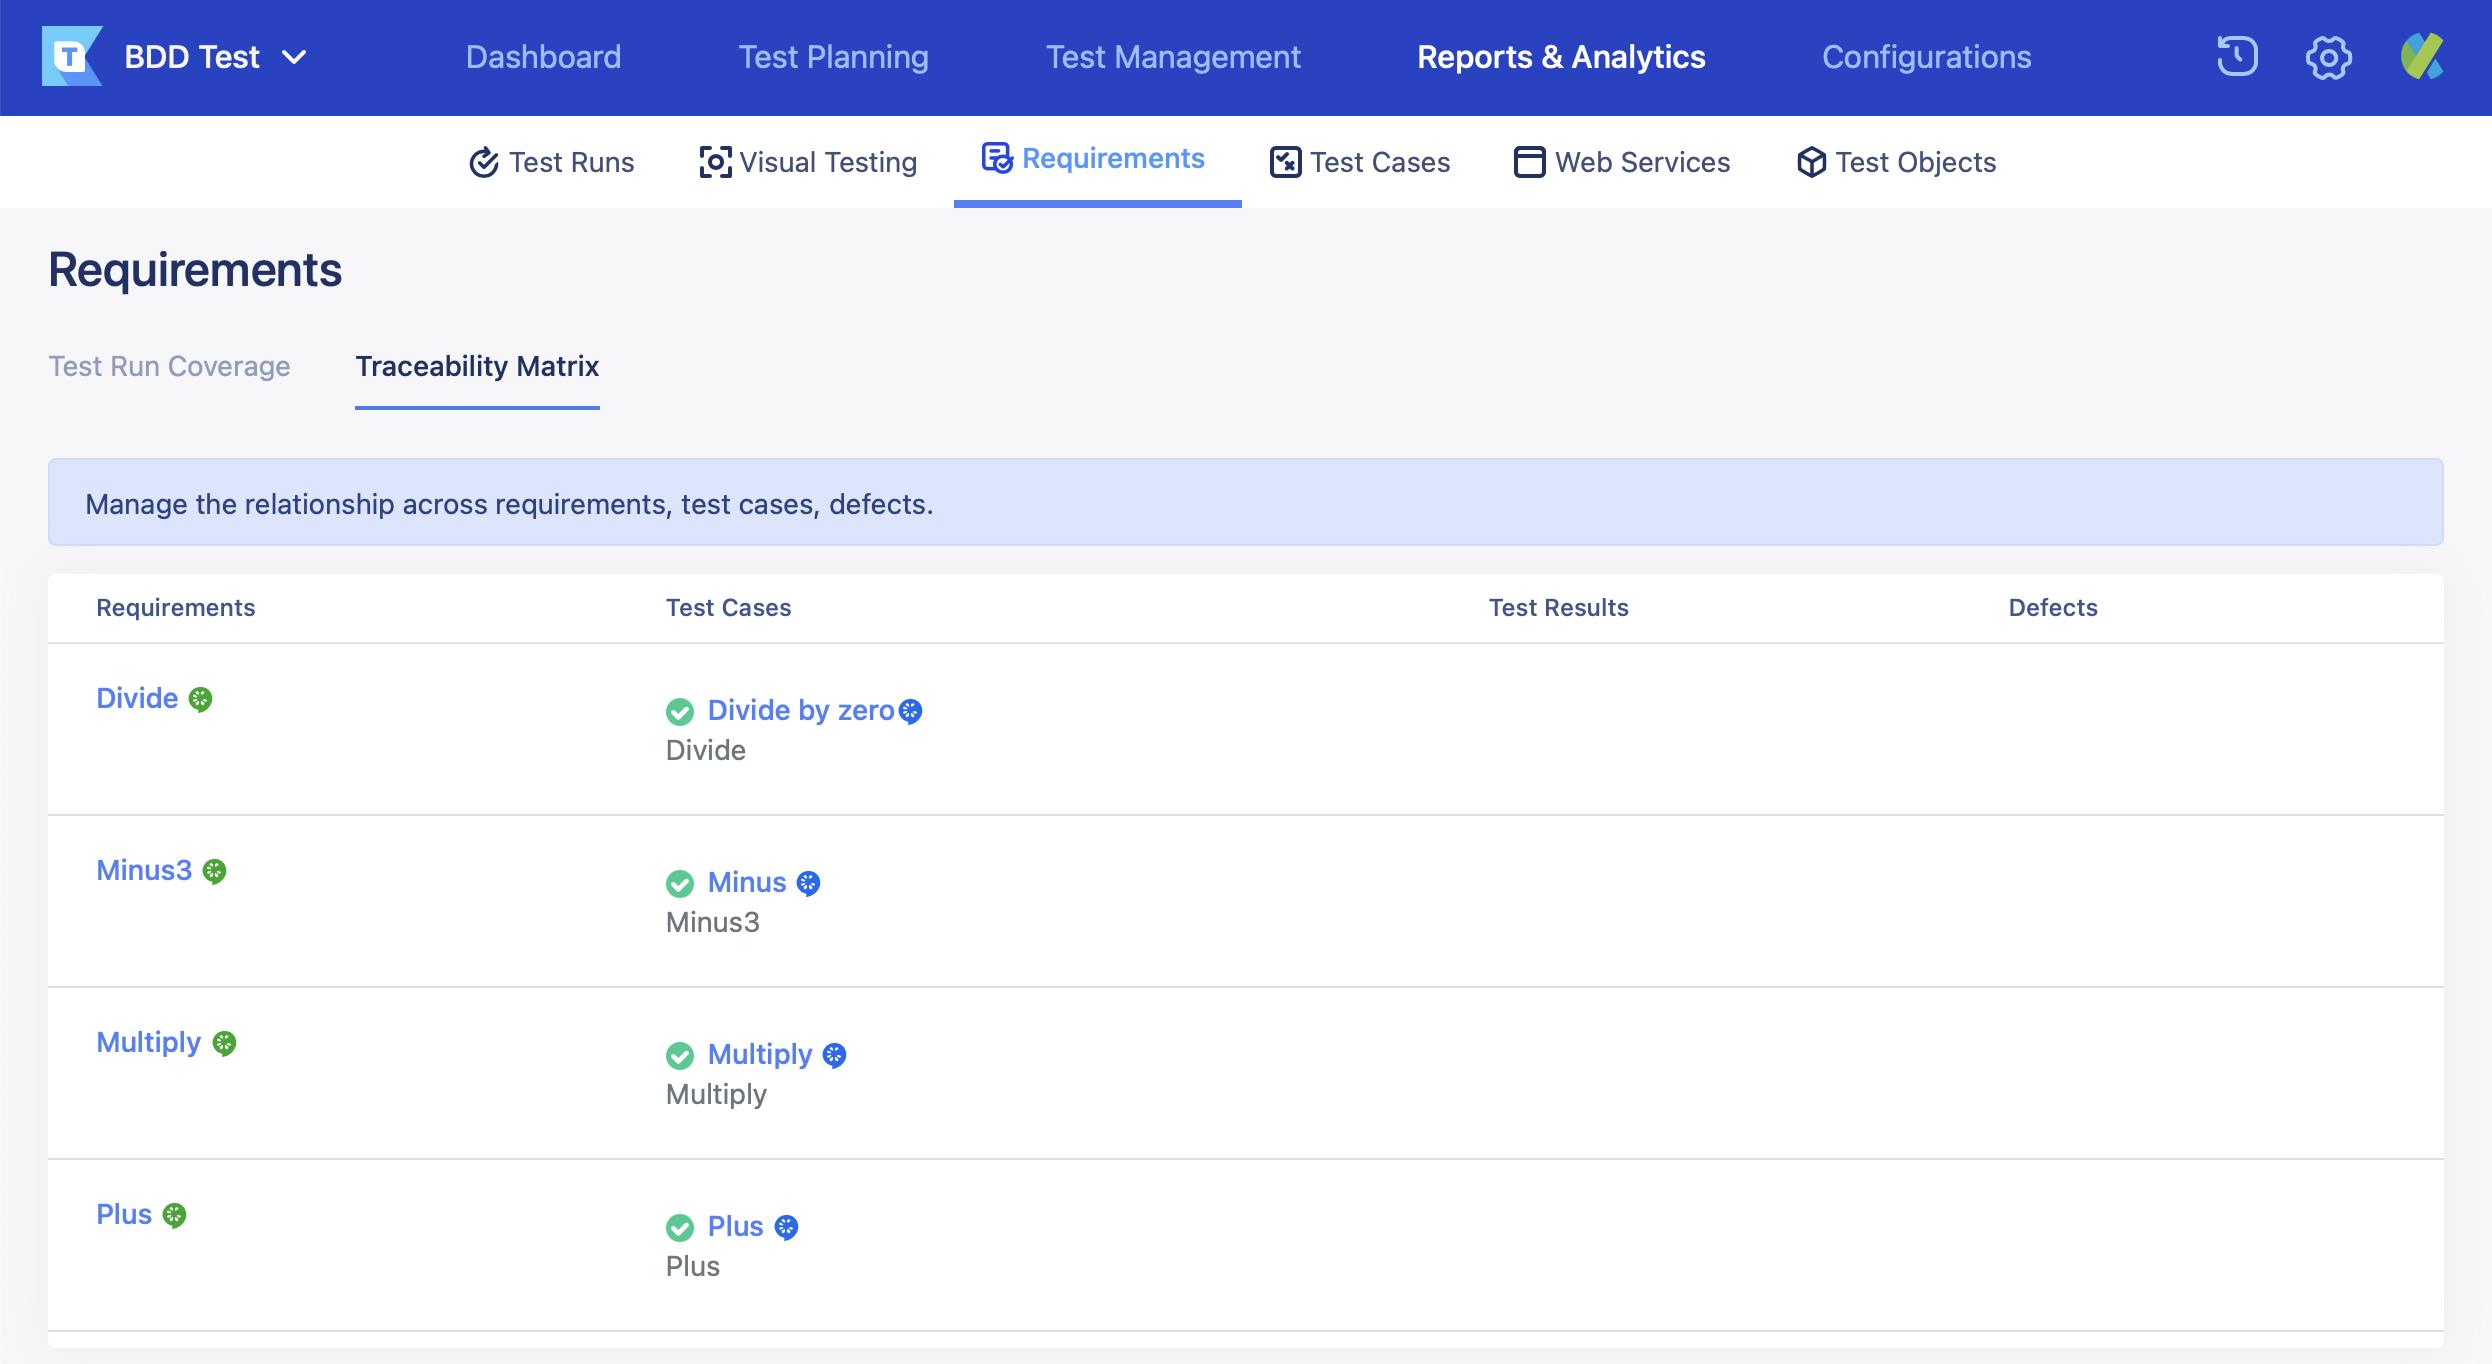 traceability matrix page